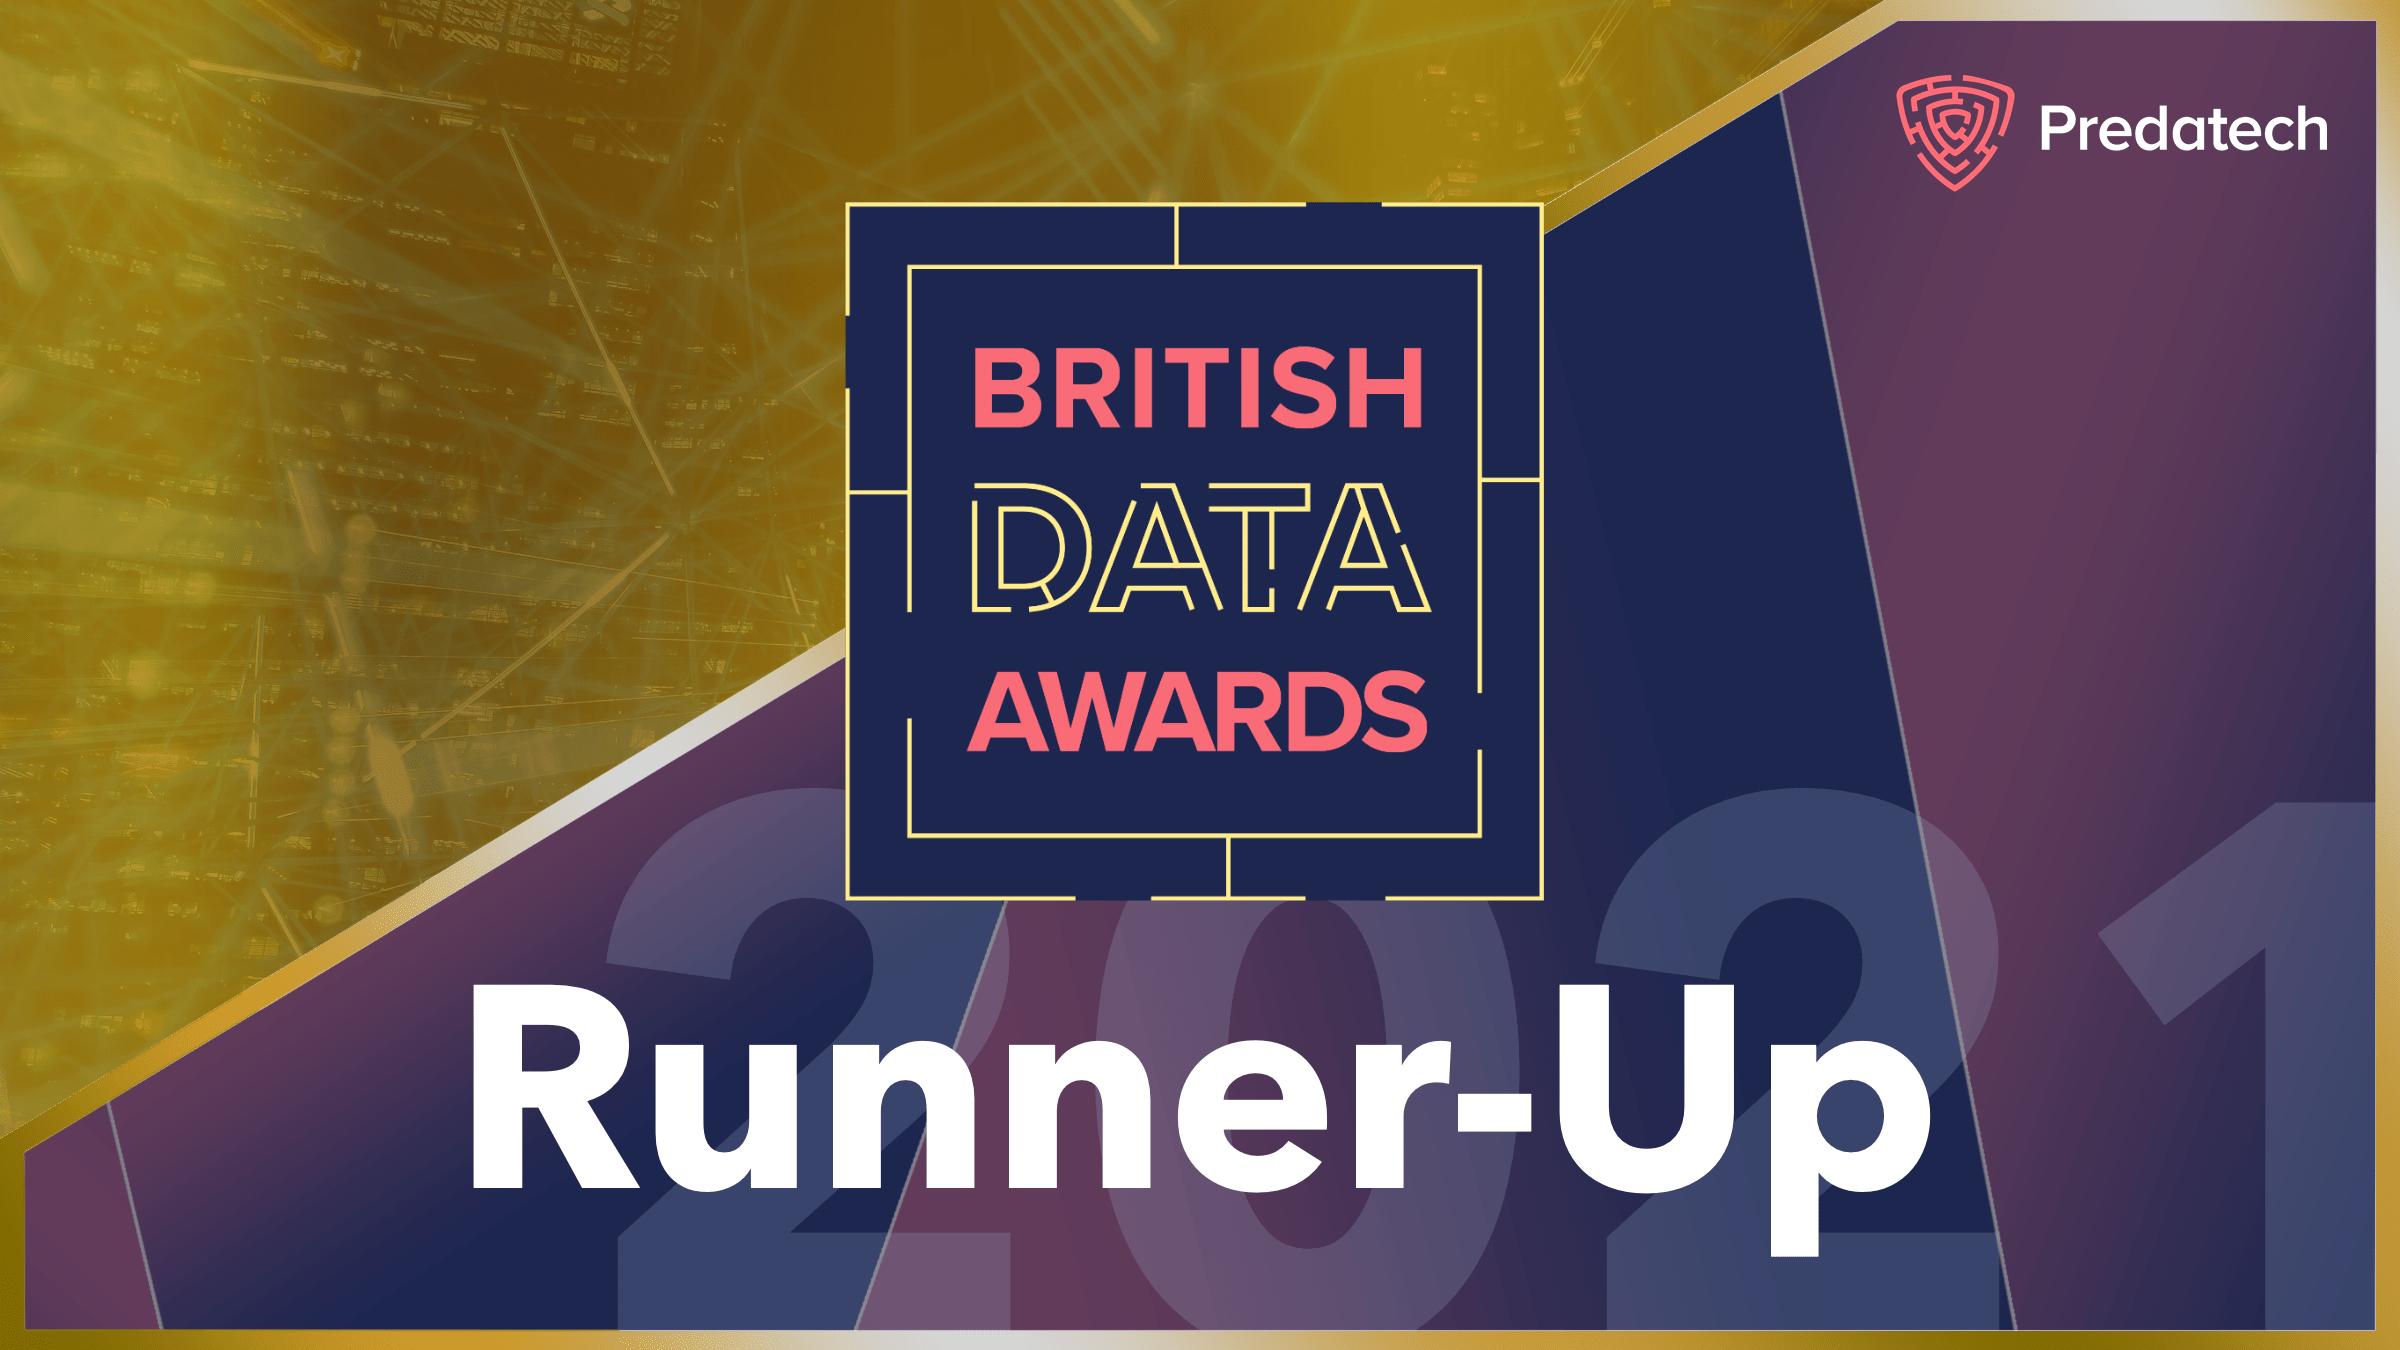 British Data Awards runner-up badge